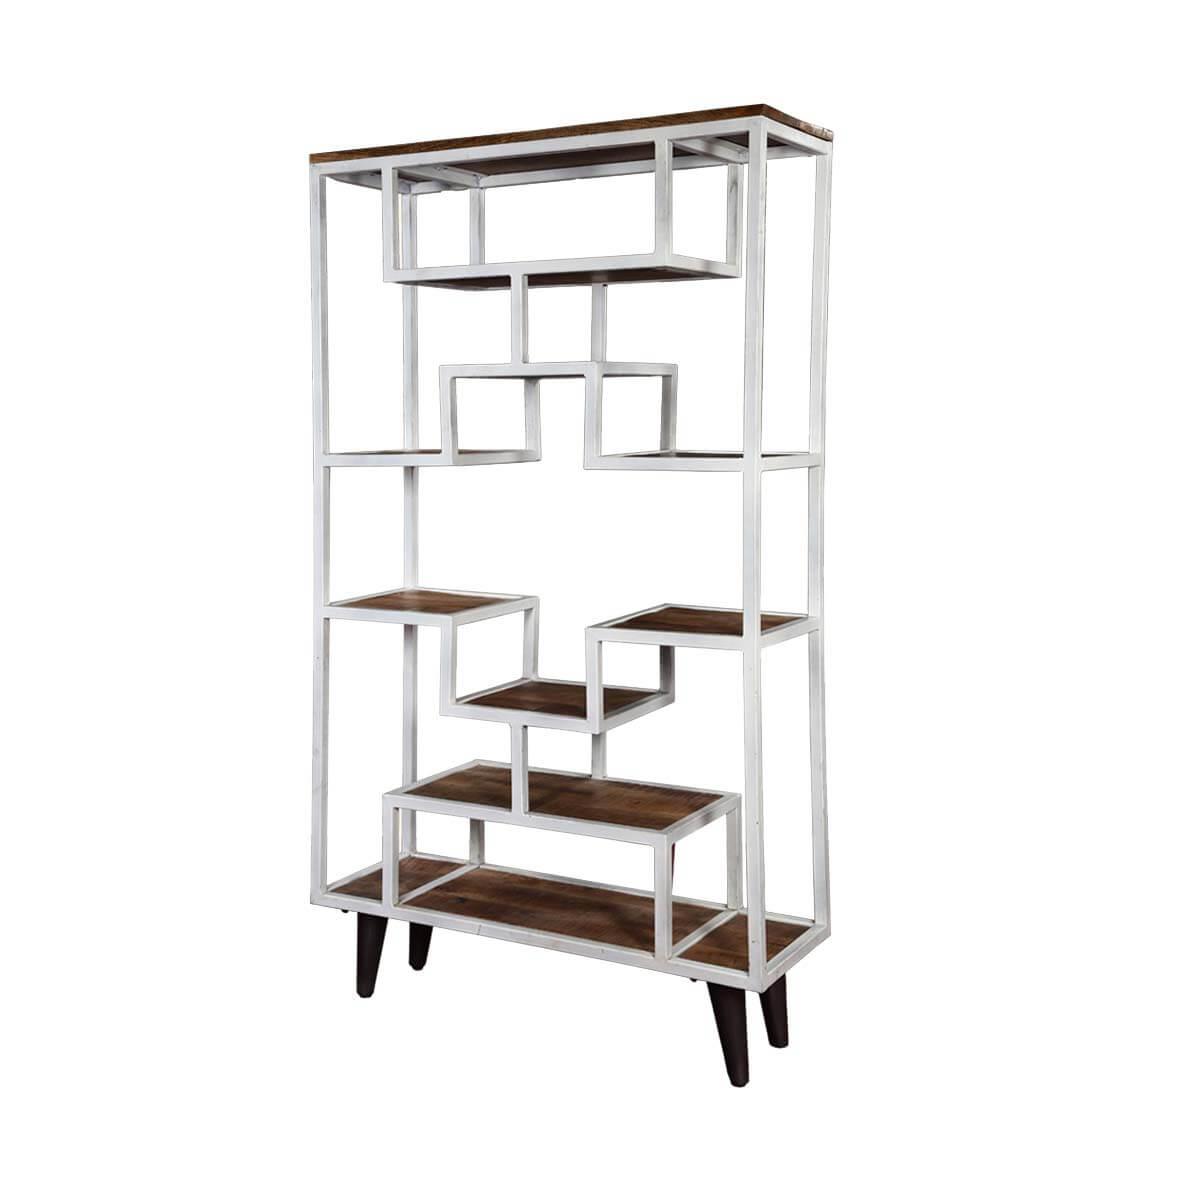 Ystad 39 Mid-Century Modern Geometric Bookcase